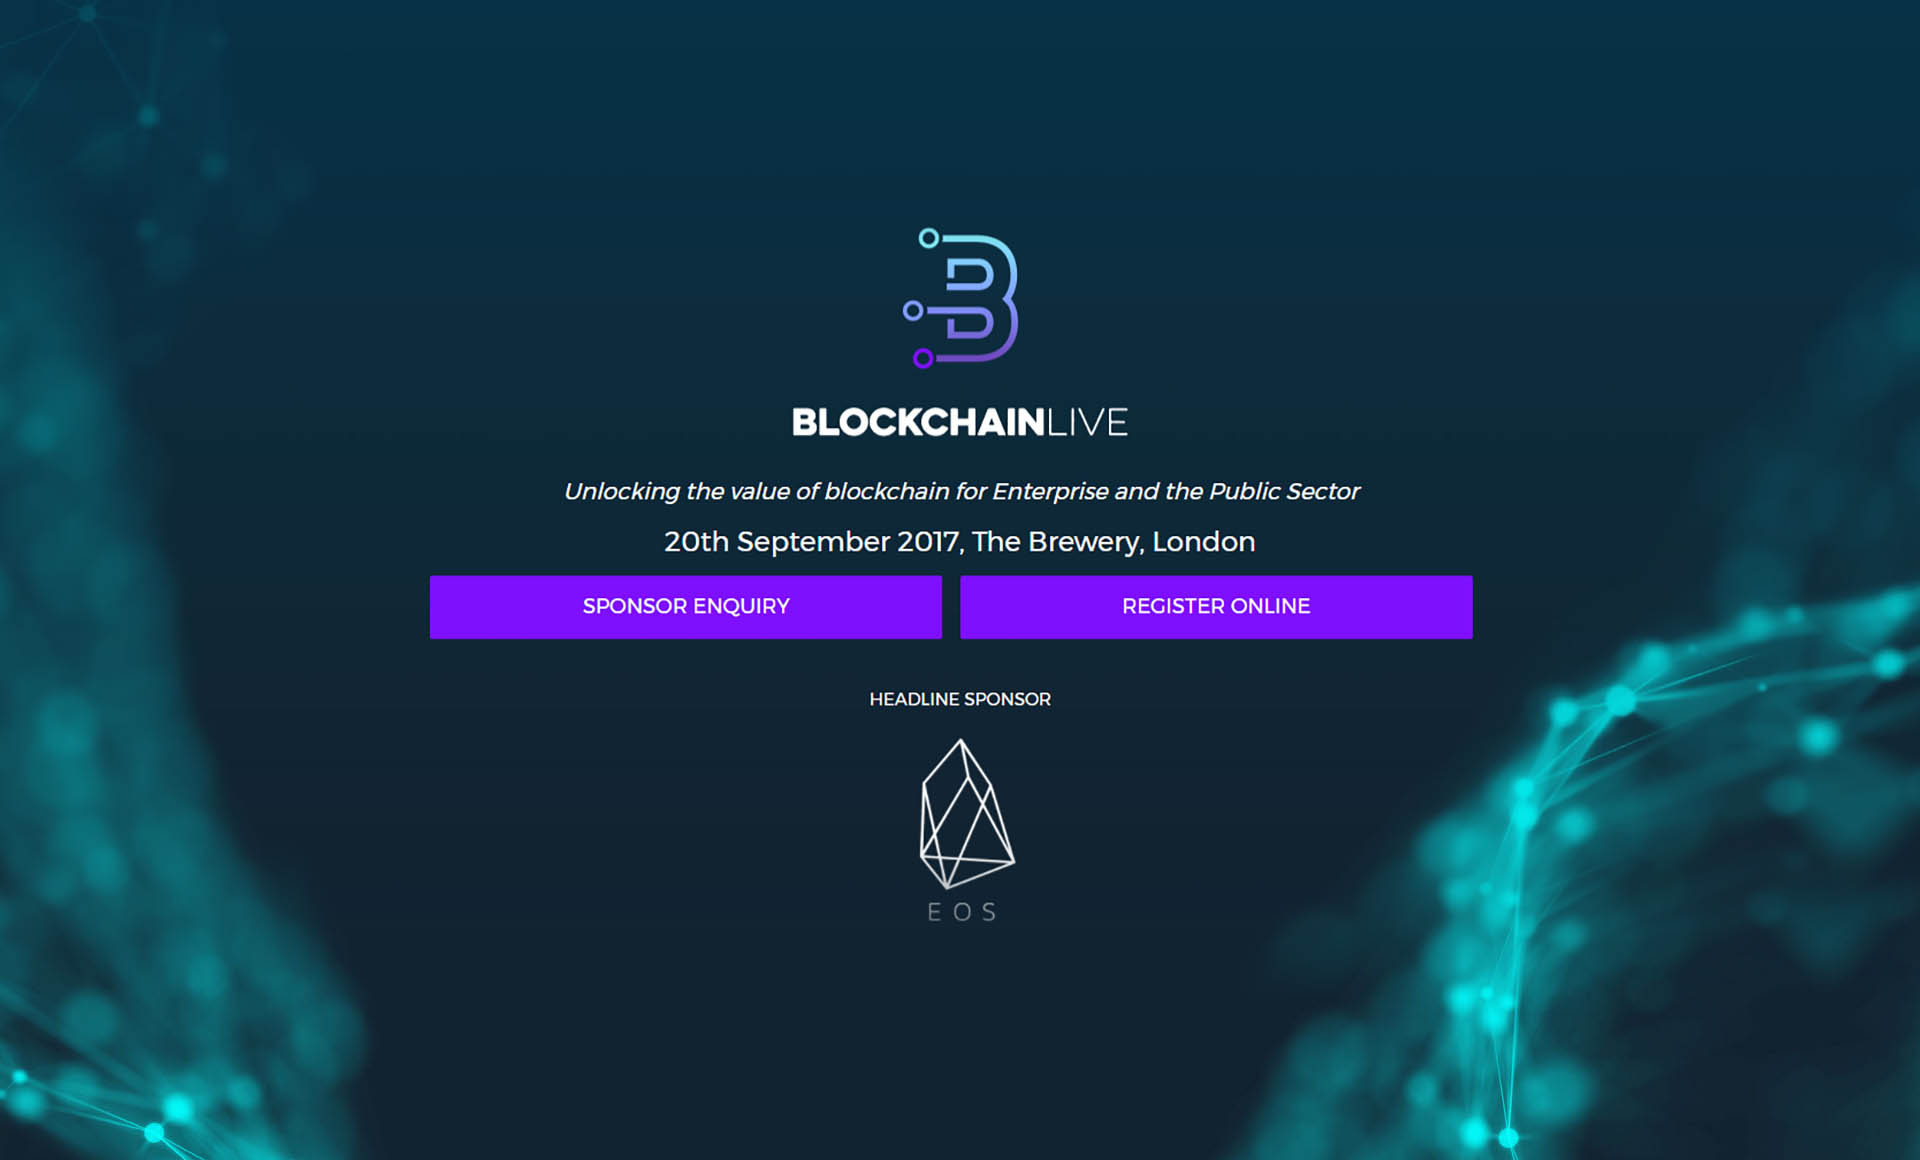 Blockchain Live Confirms Headline Partner Sponsor Block.on